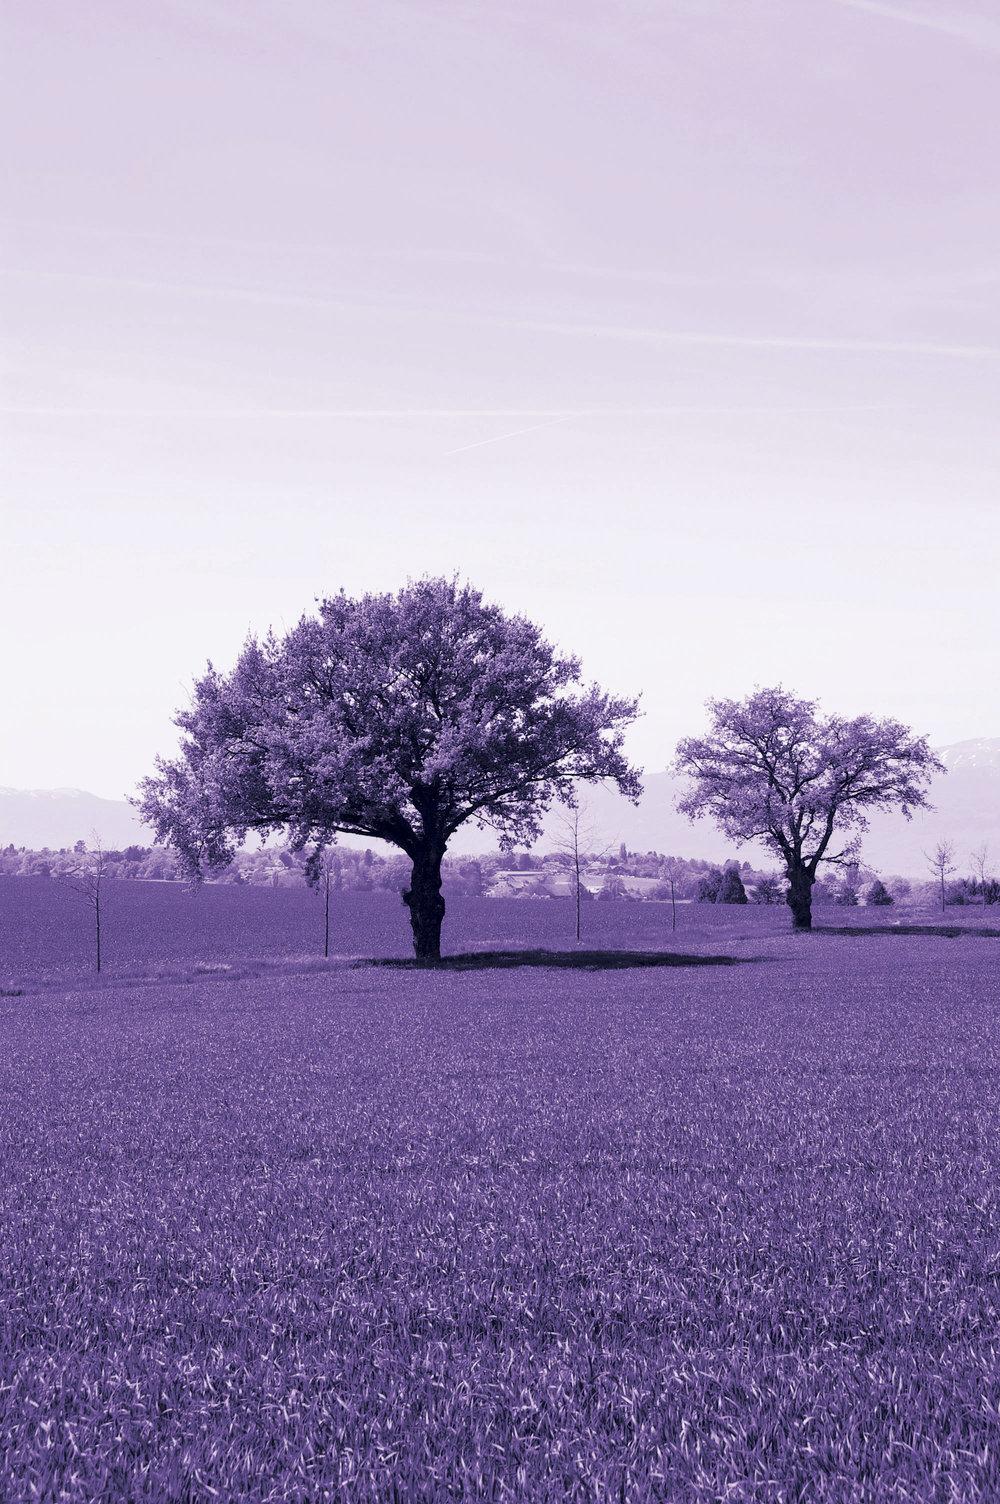 Arbre fond violet .jpg